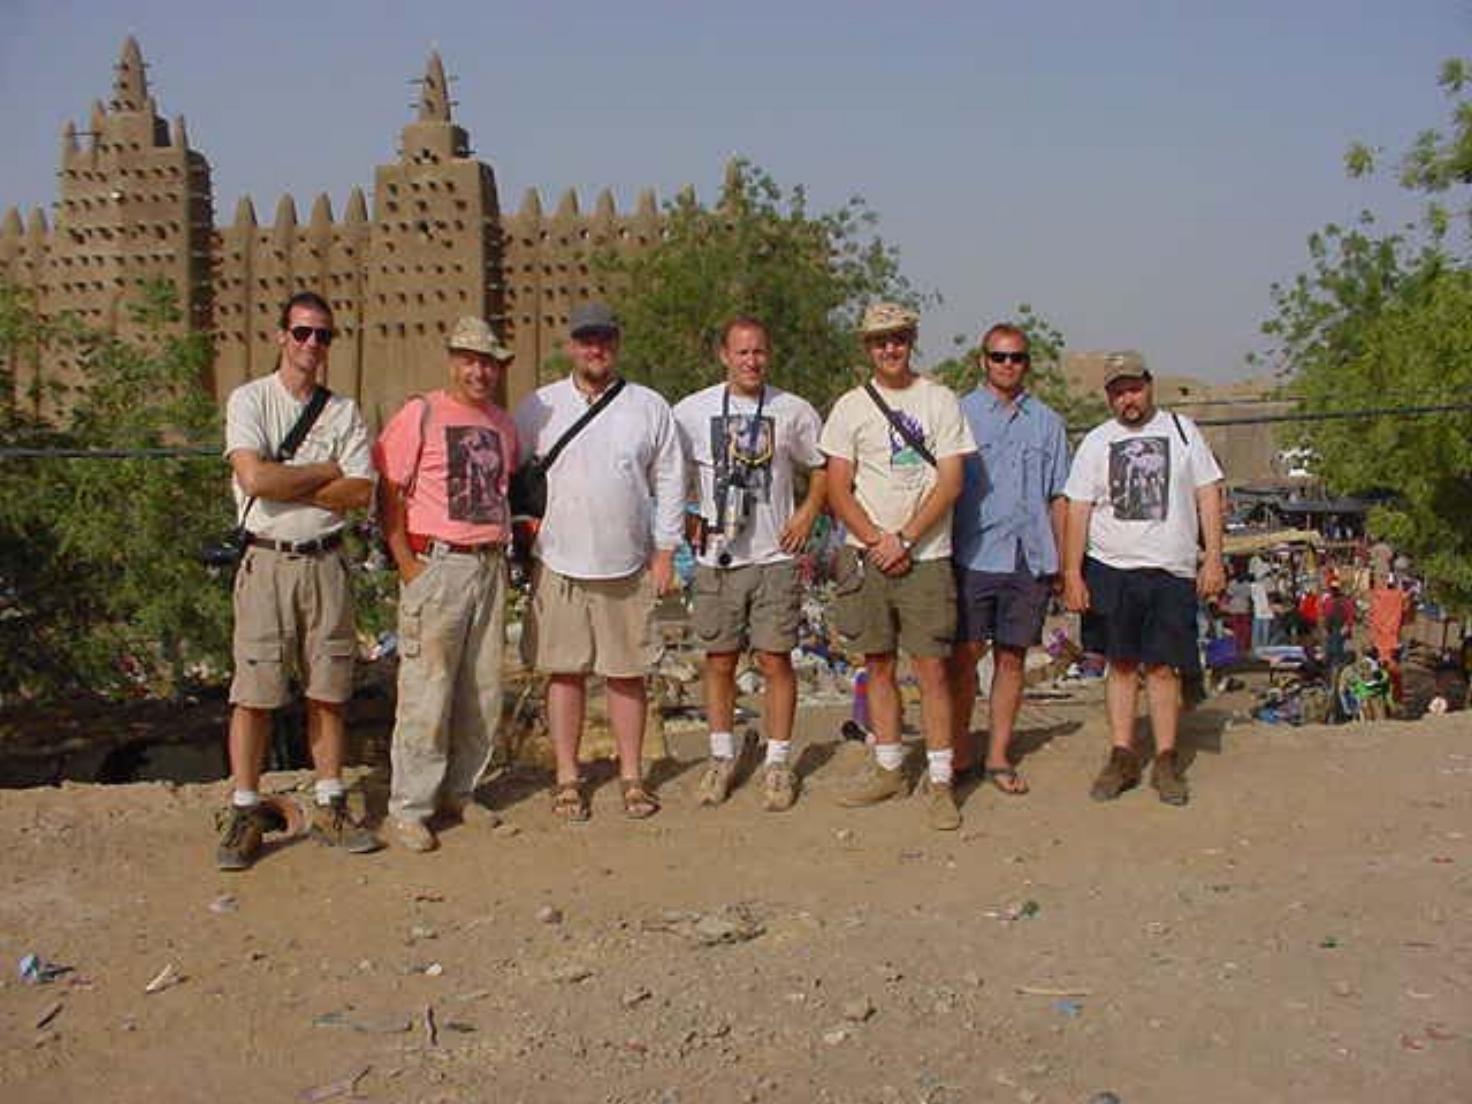 Drive The Globe Expedition Team (L-R) Jim Leach, Al Cornell, Paul Shumway, Michael Ladden, Wilson Bullard, Shane Ballensky, Ed Messenger